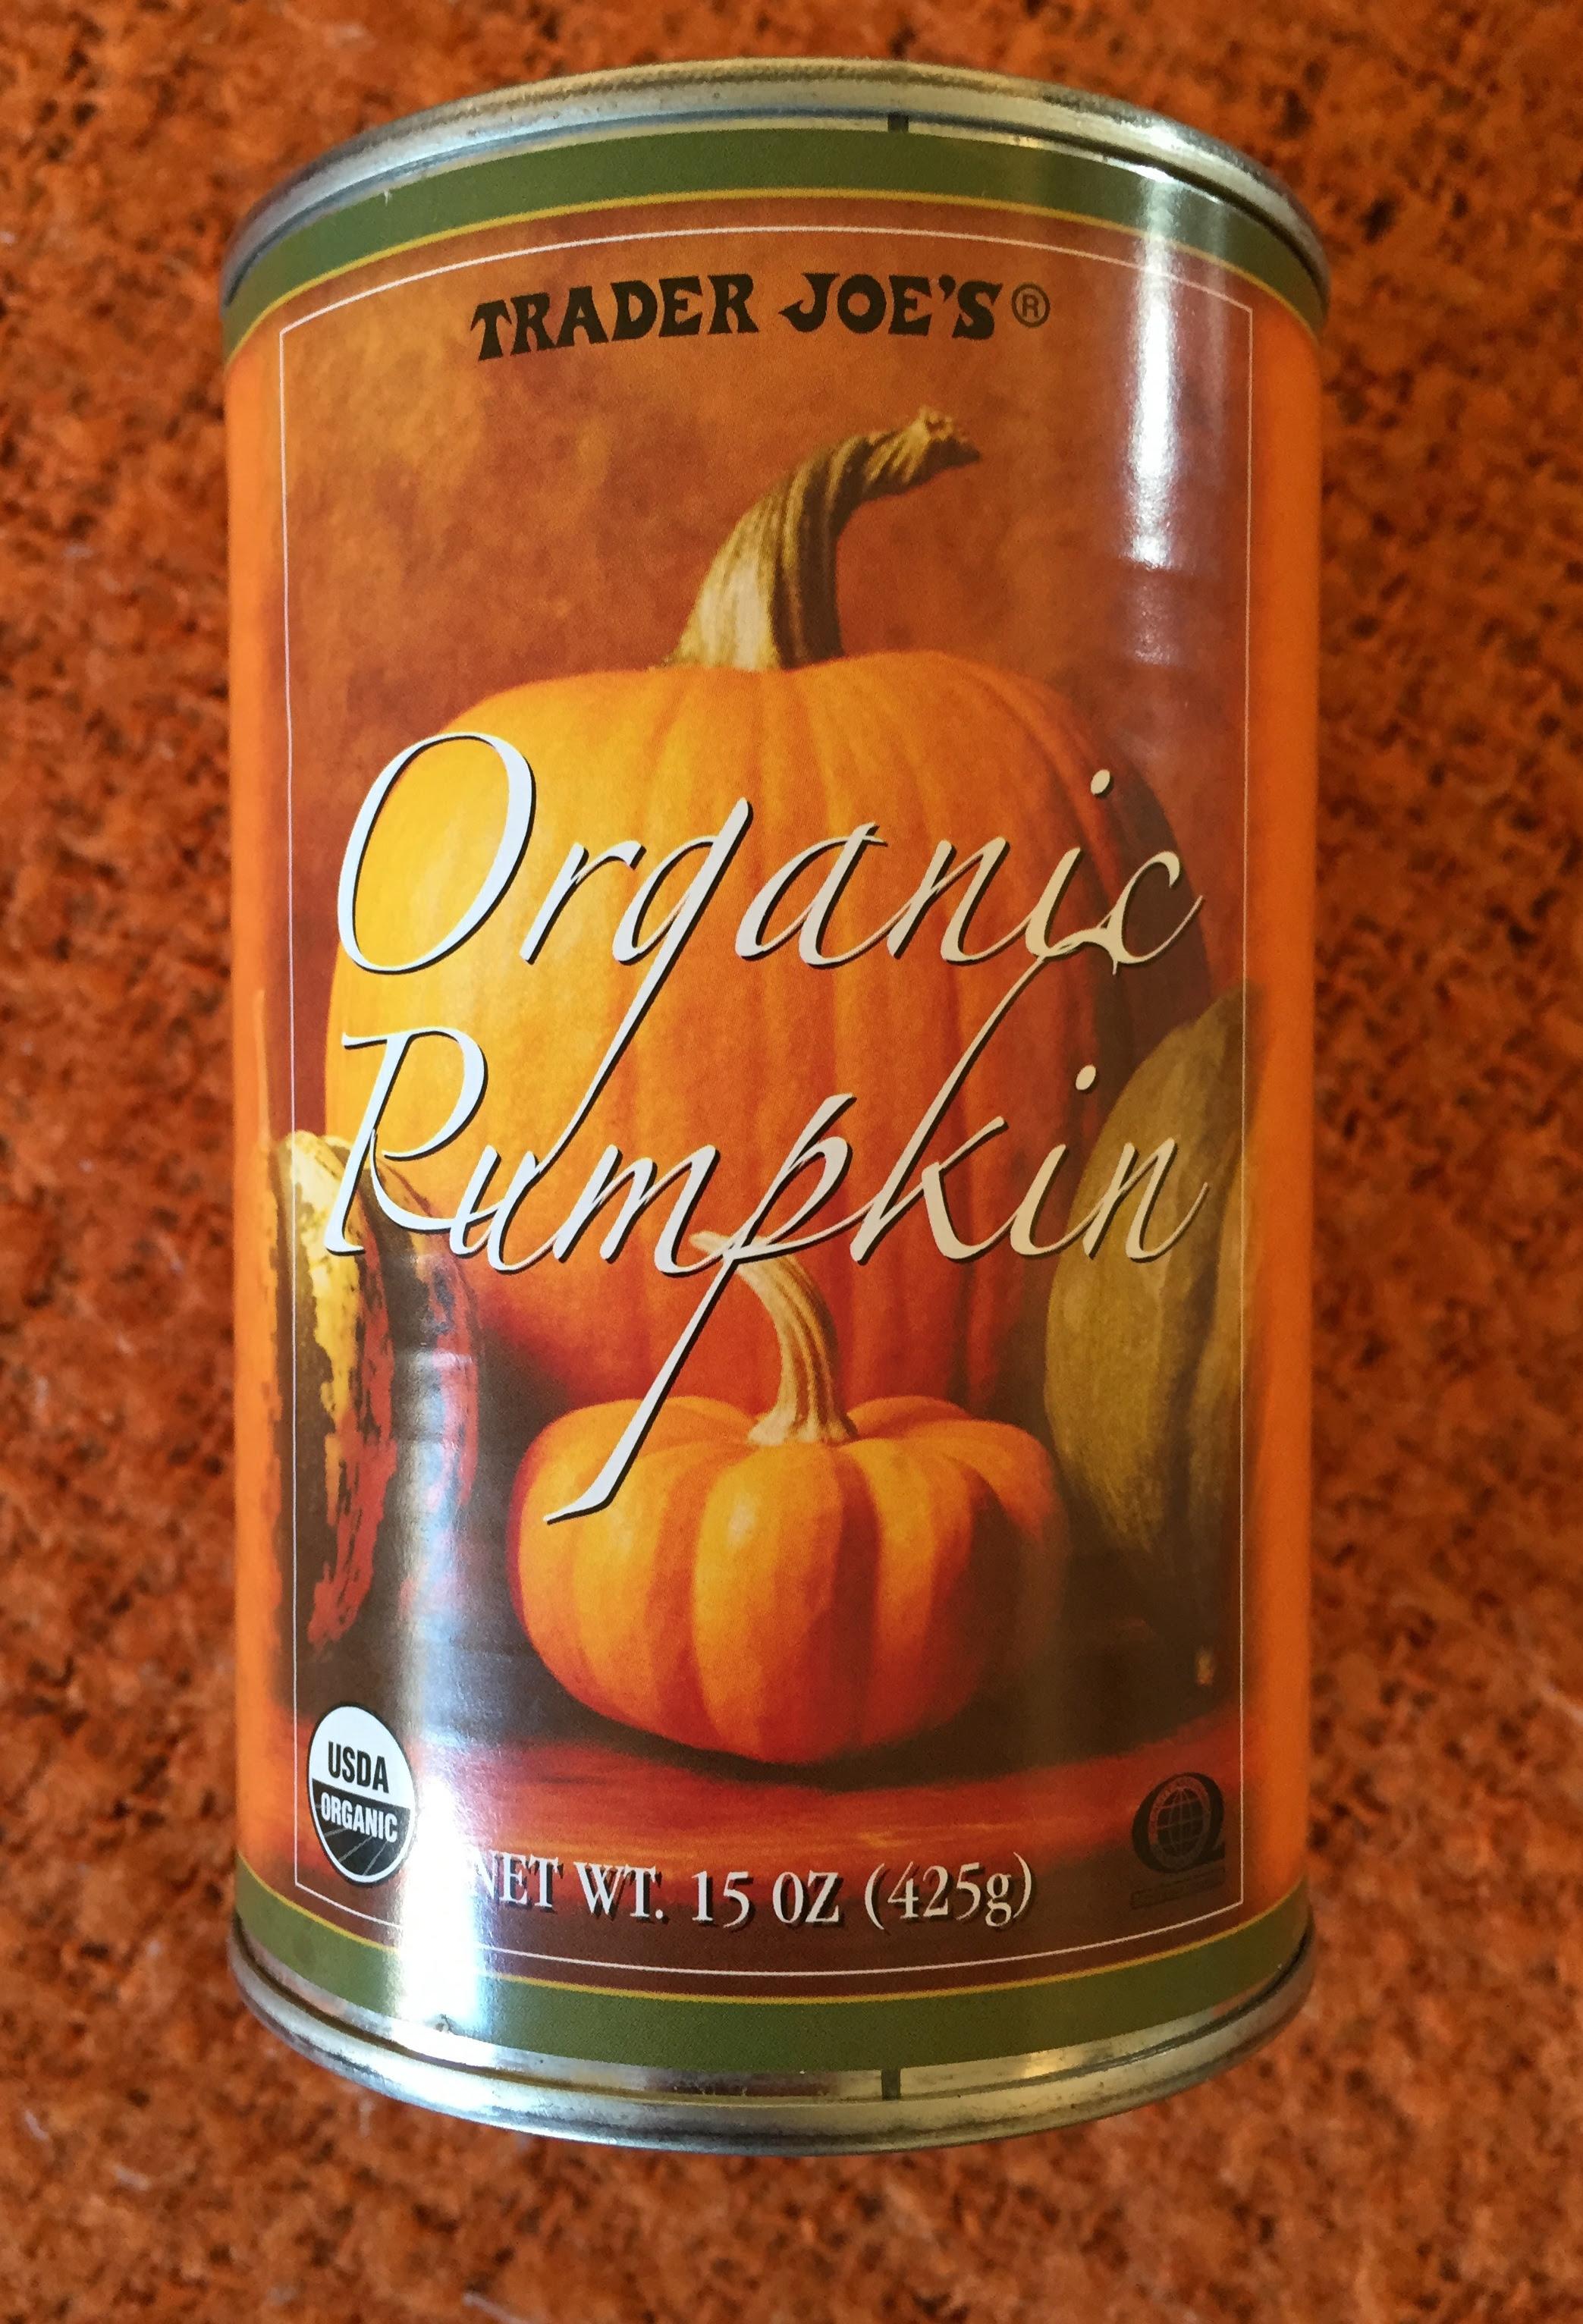 trader joe's pumpkin pie calories